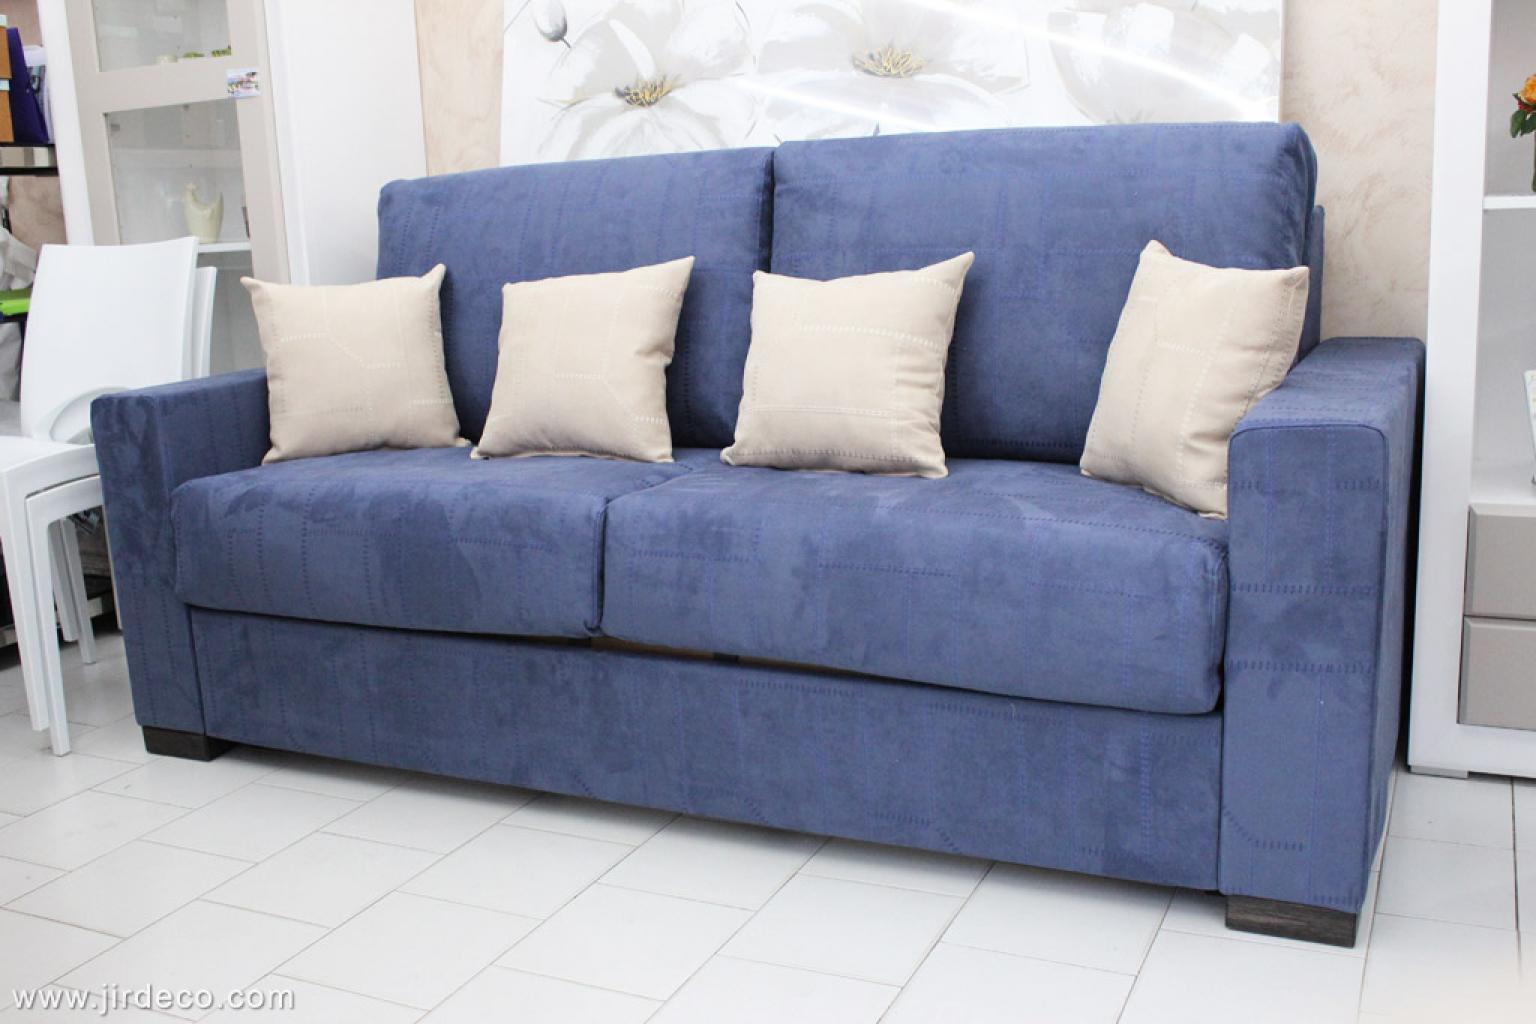 s canapé bleu nuit